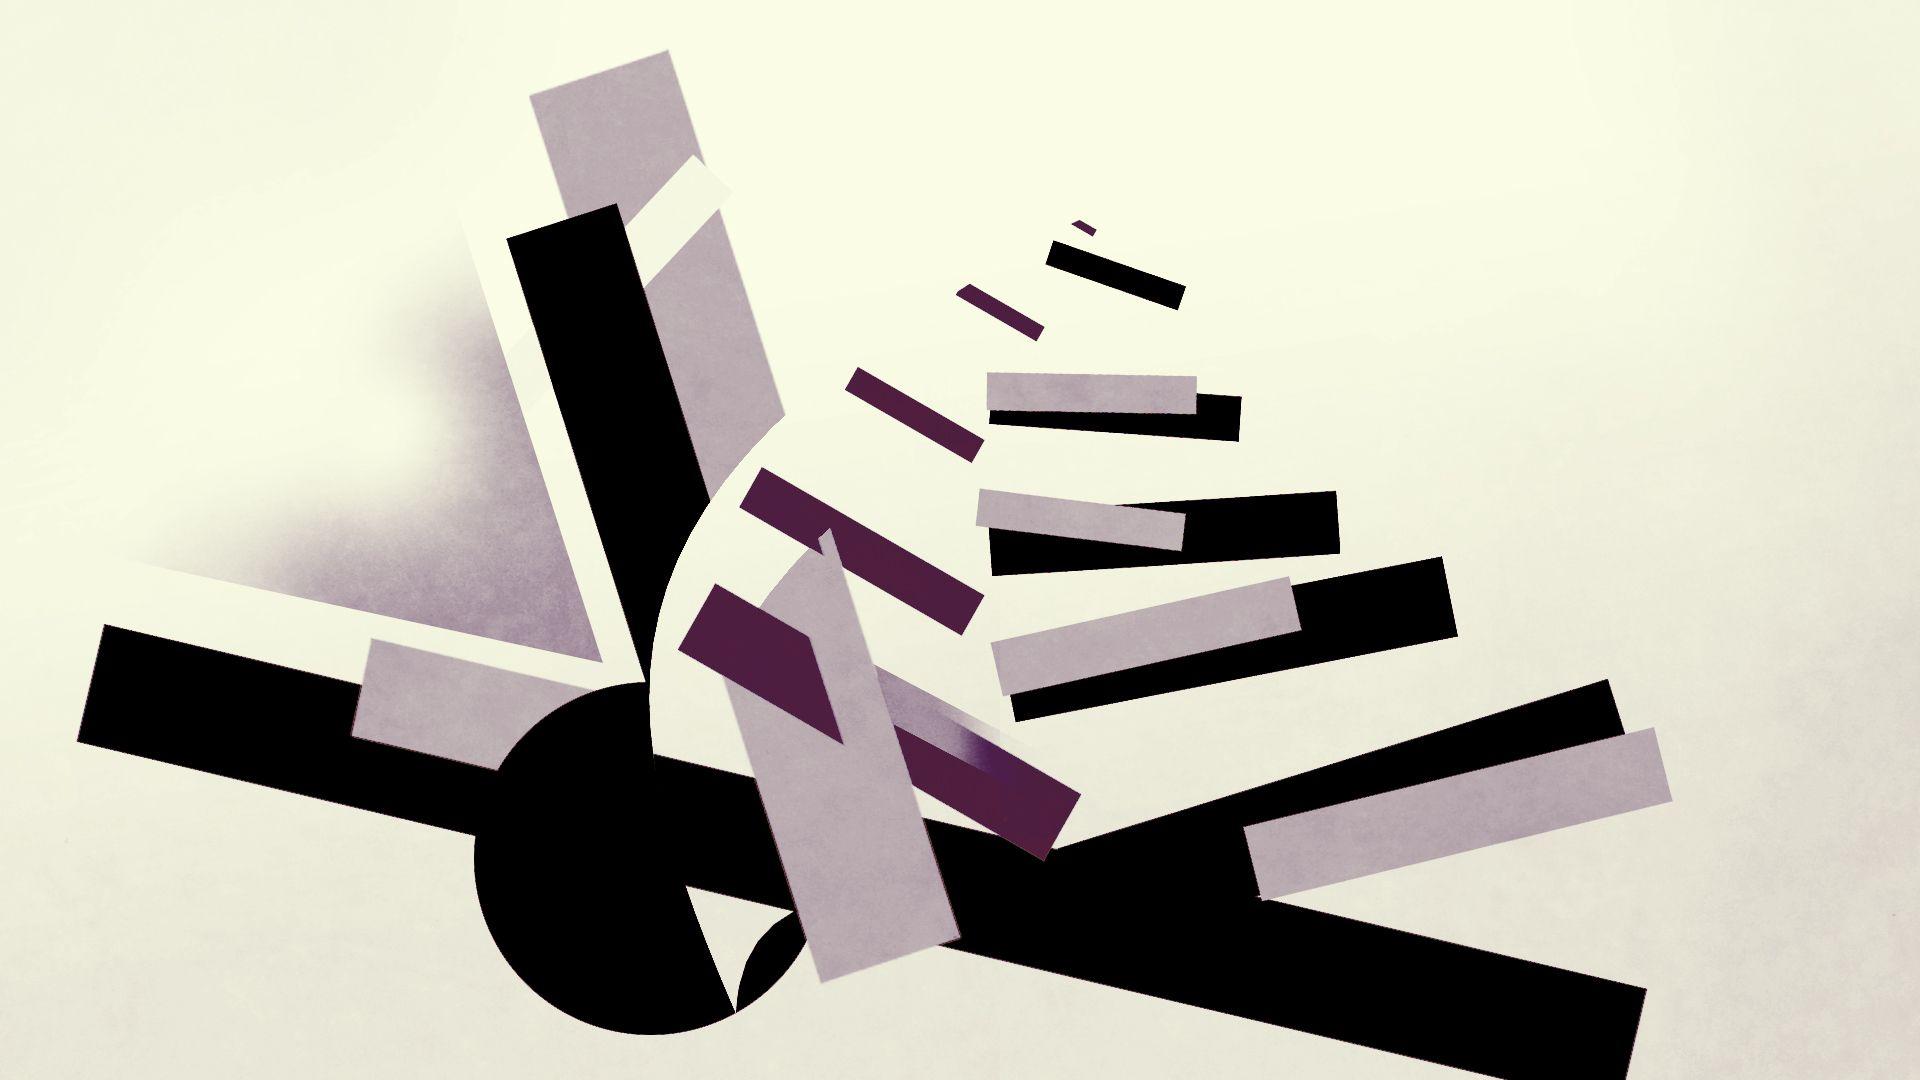 Digital_Suprematism_by_SoulRiseCaTo.jpg (1920×1080)